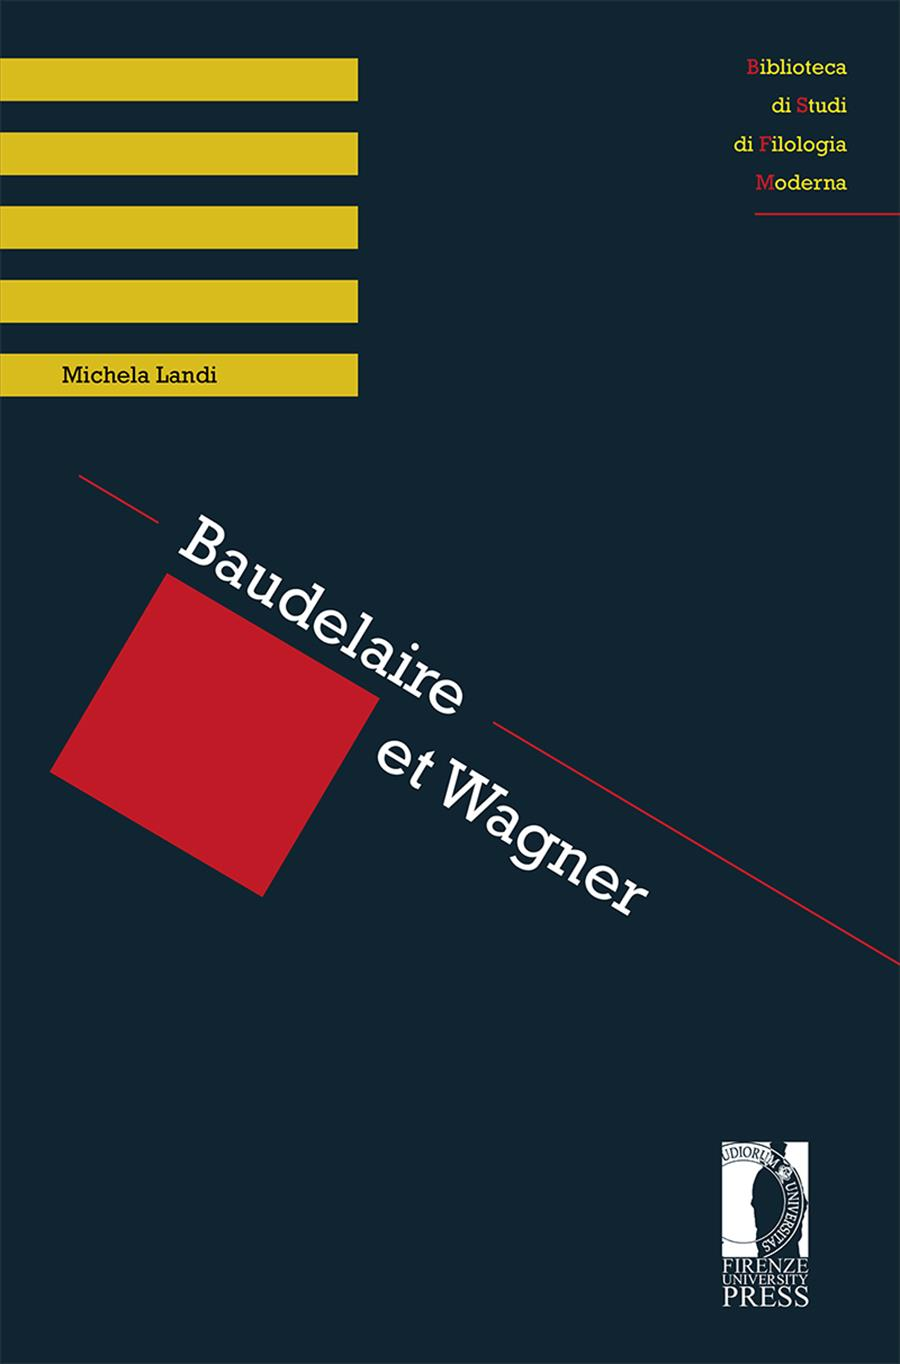 Baudelaire et Wagner